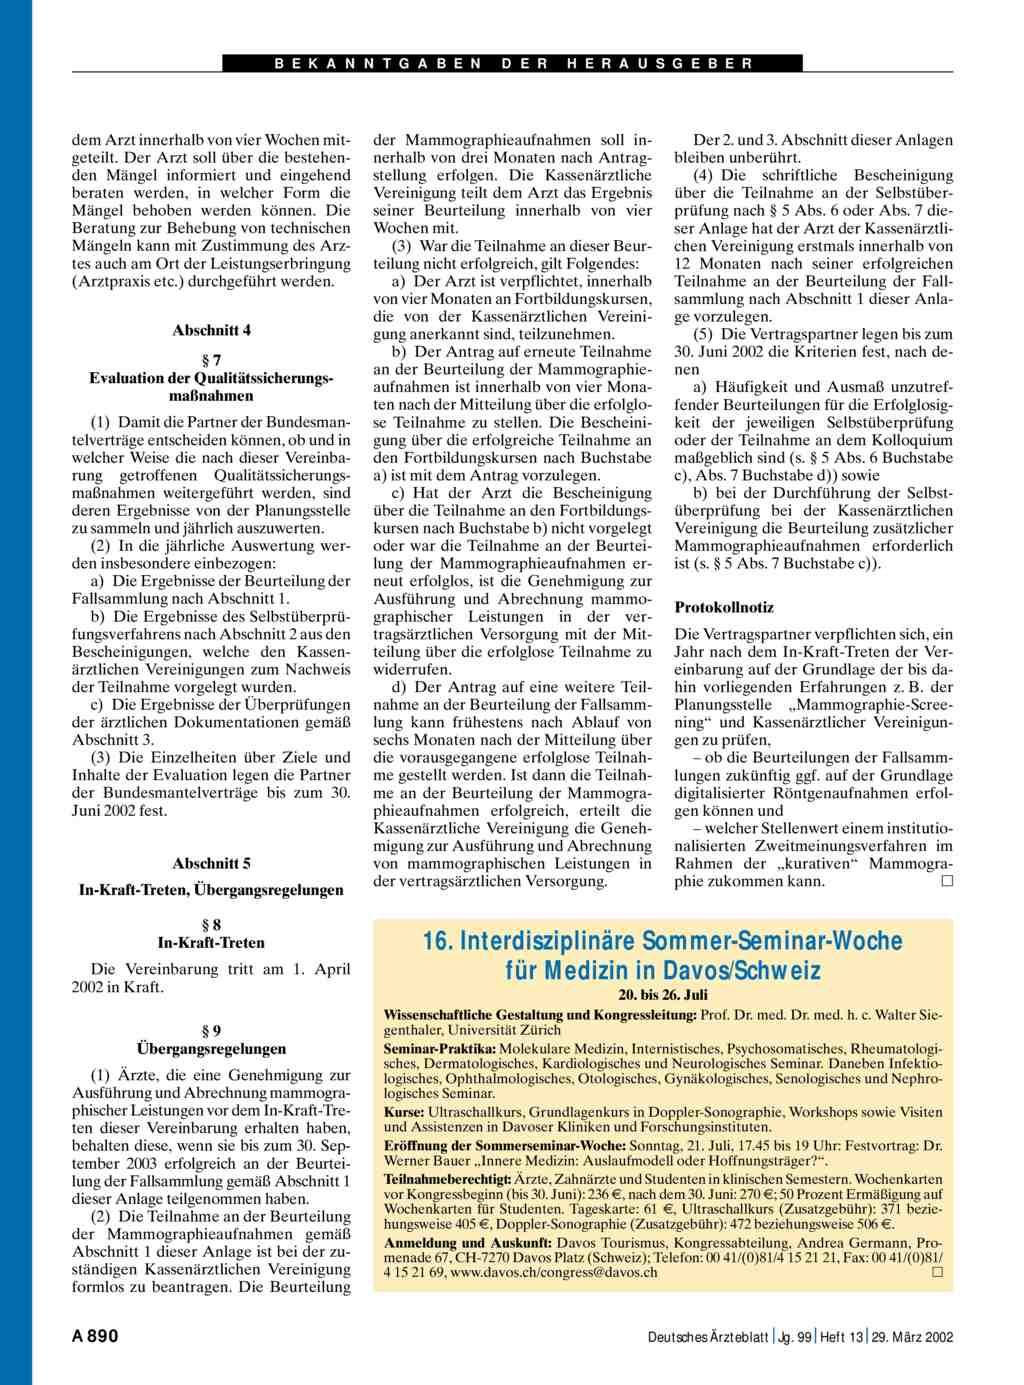 16 interdisziplin re sommer seminar woche f r medizin in for Medizin studieren schweiz